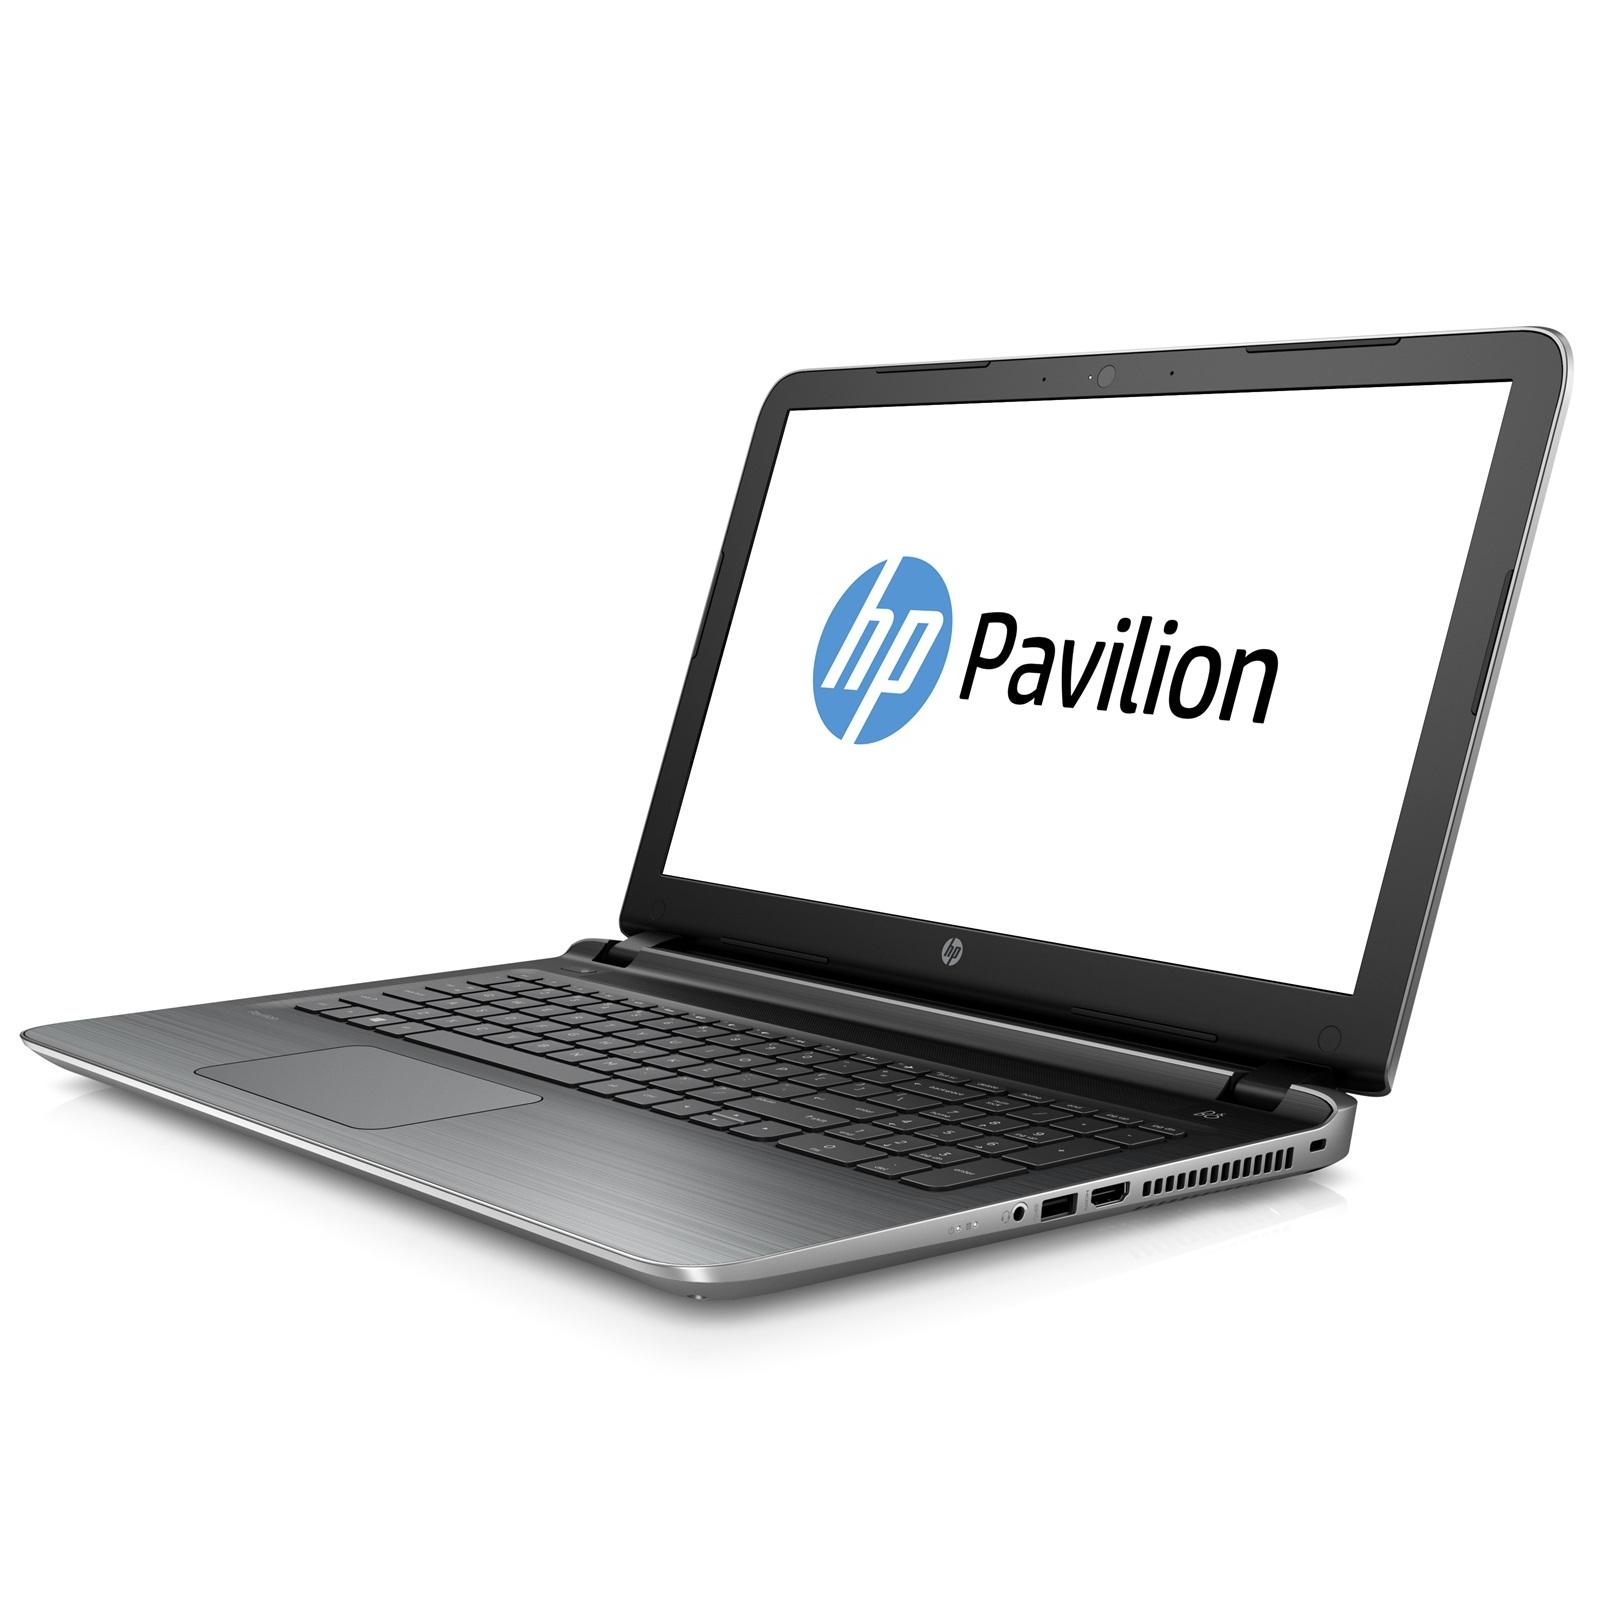 Máy tính xách tay HP Pavilion 15-AB036TU M4Y32PA (White)